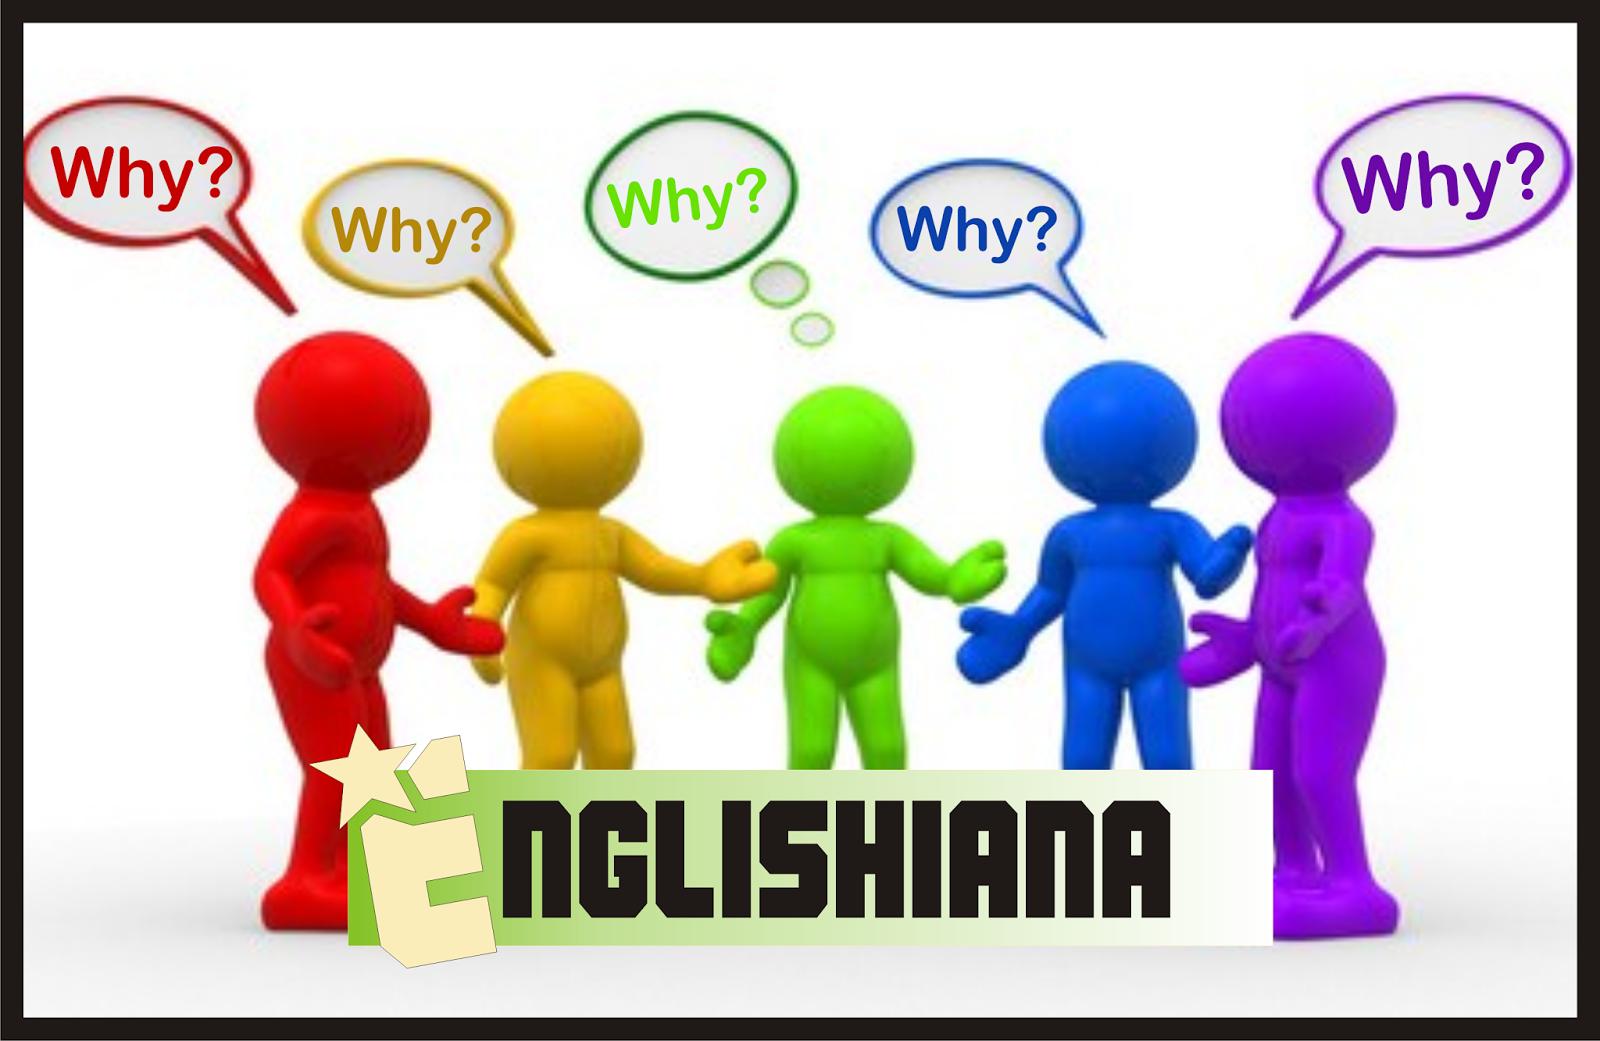 Kumpulan Contoh Artikel Bahasa Inggris Tentang Pendidikan Dan